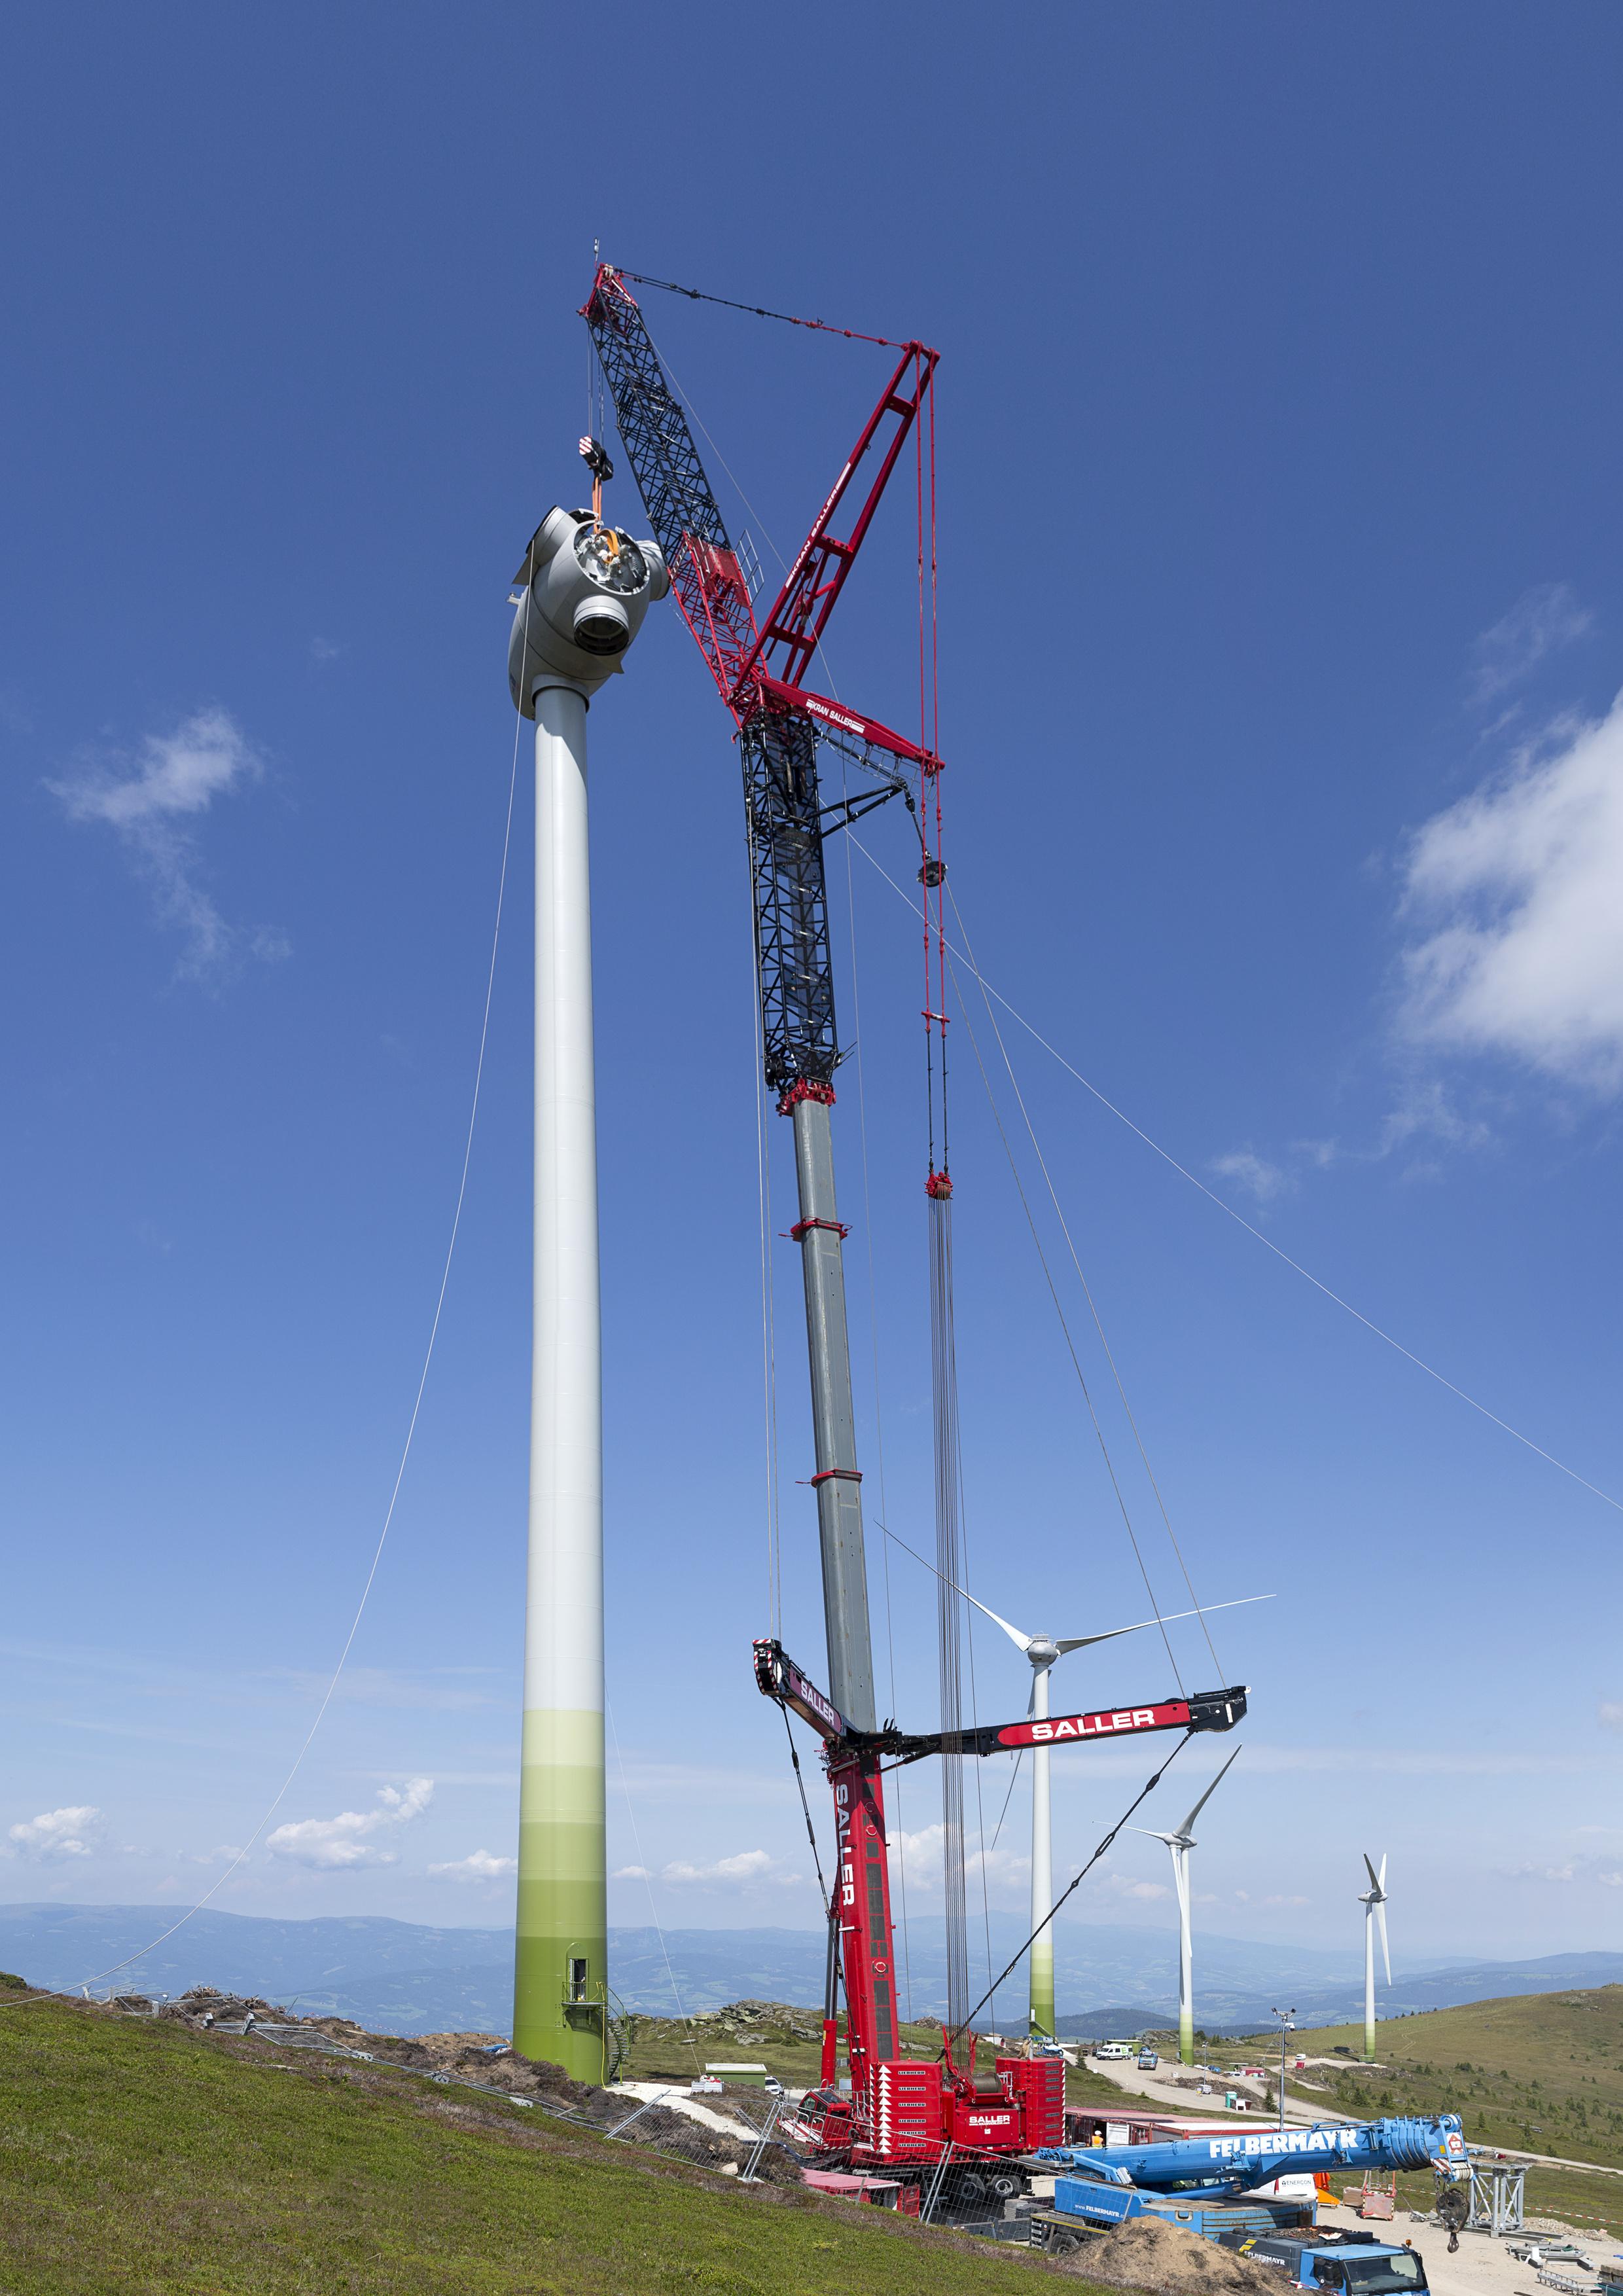 liebherr ltm 1750 9 1 erect turbines at 5 500 foot. Black Bedroom Furniture Sets. Home Design Ideas